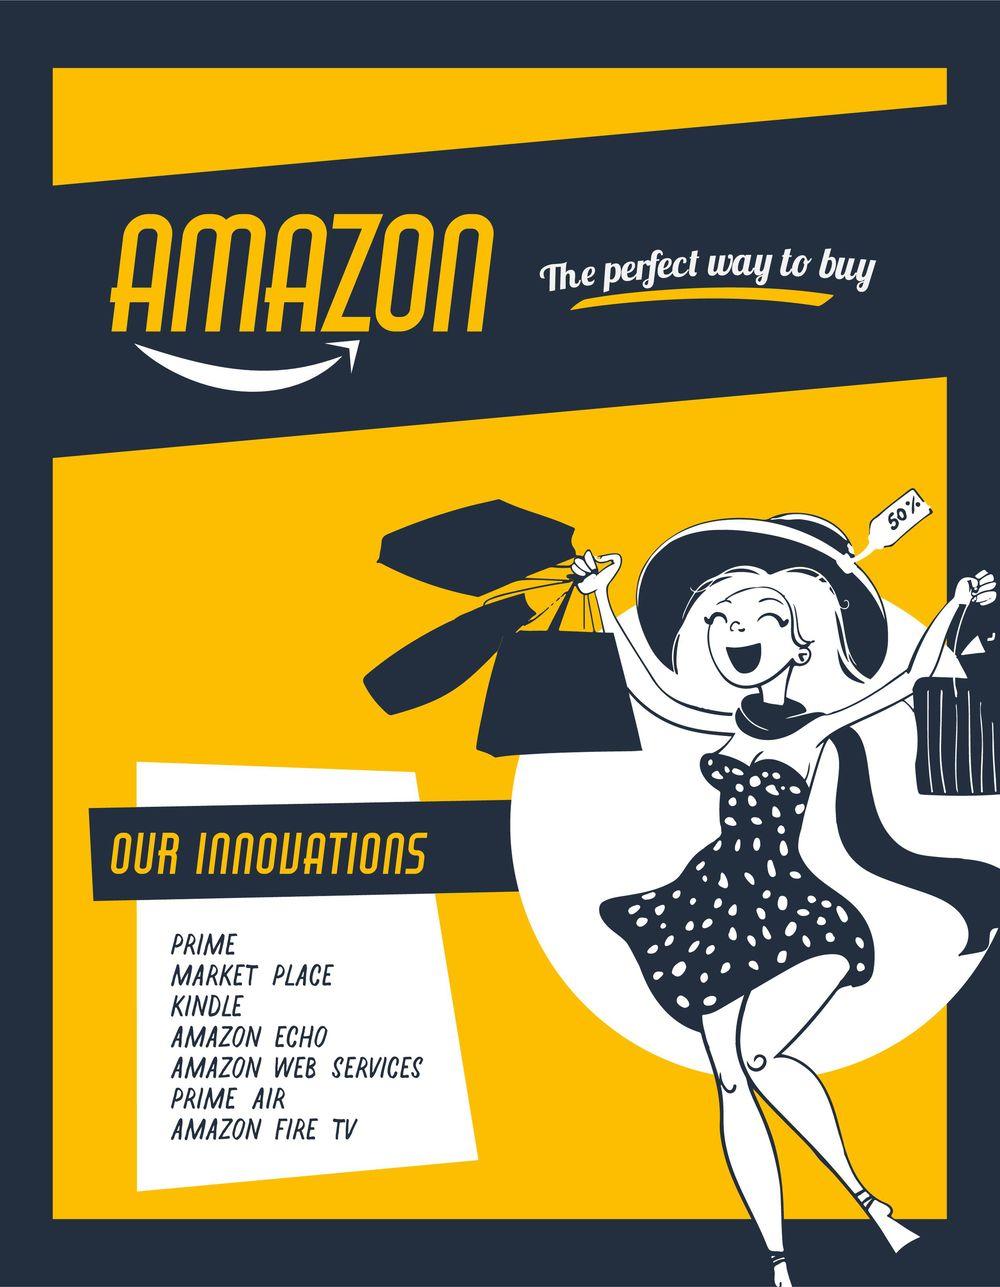 Amazon - image 2 - student project